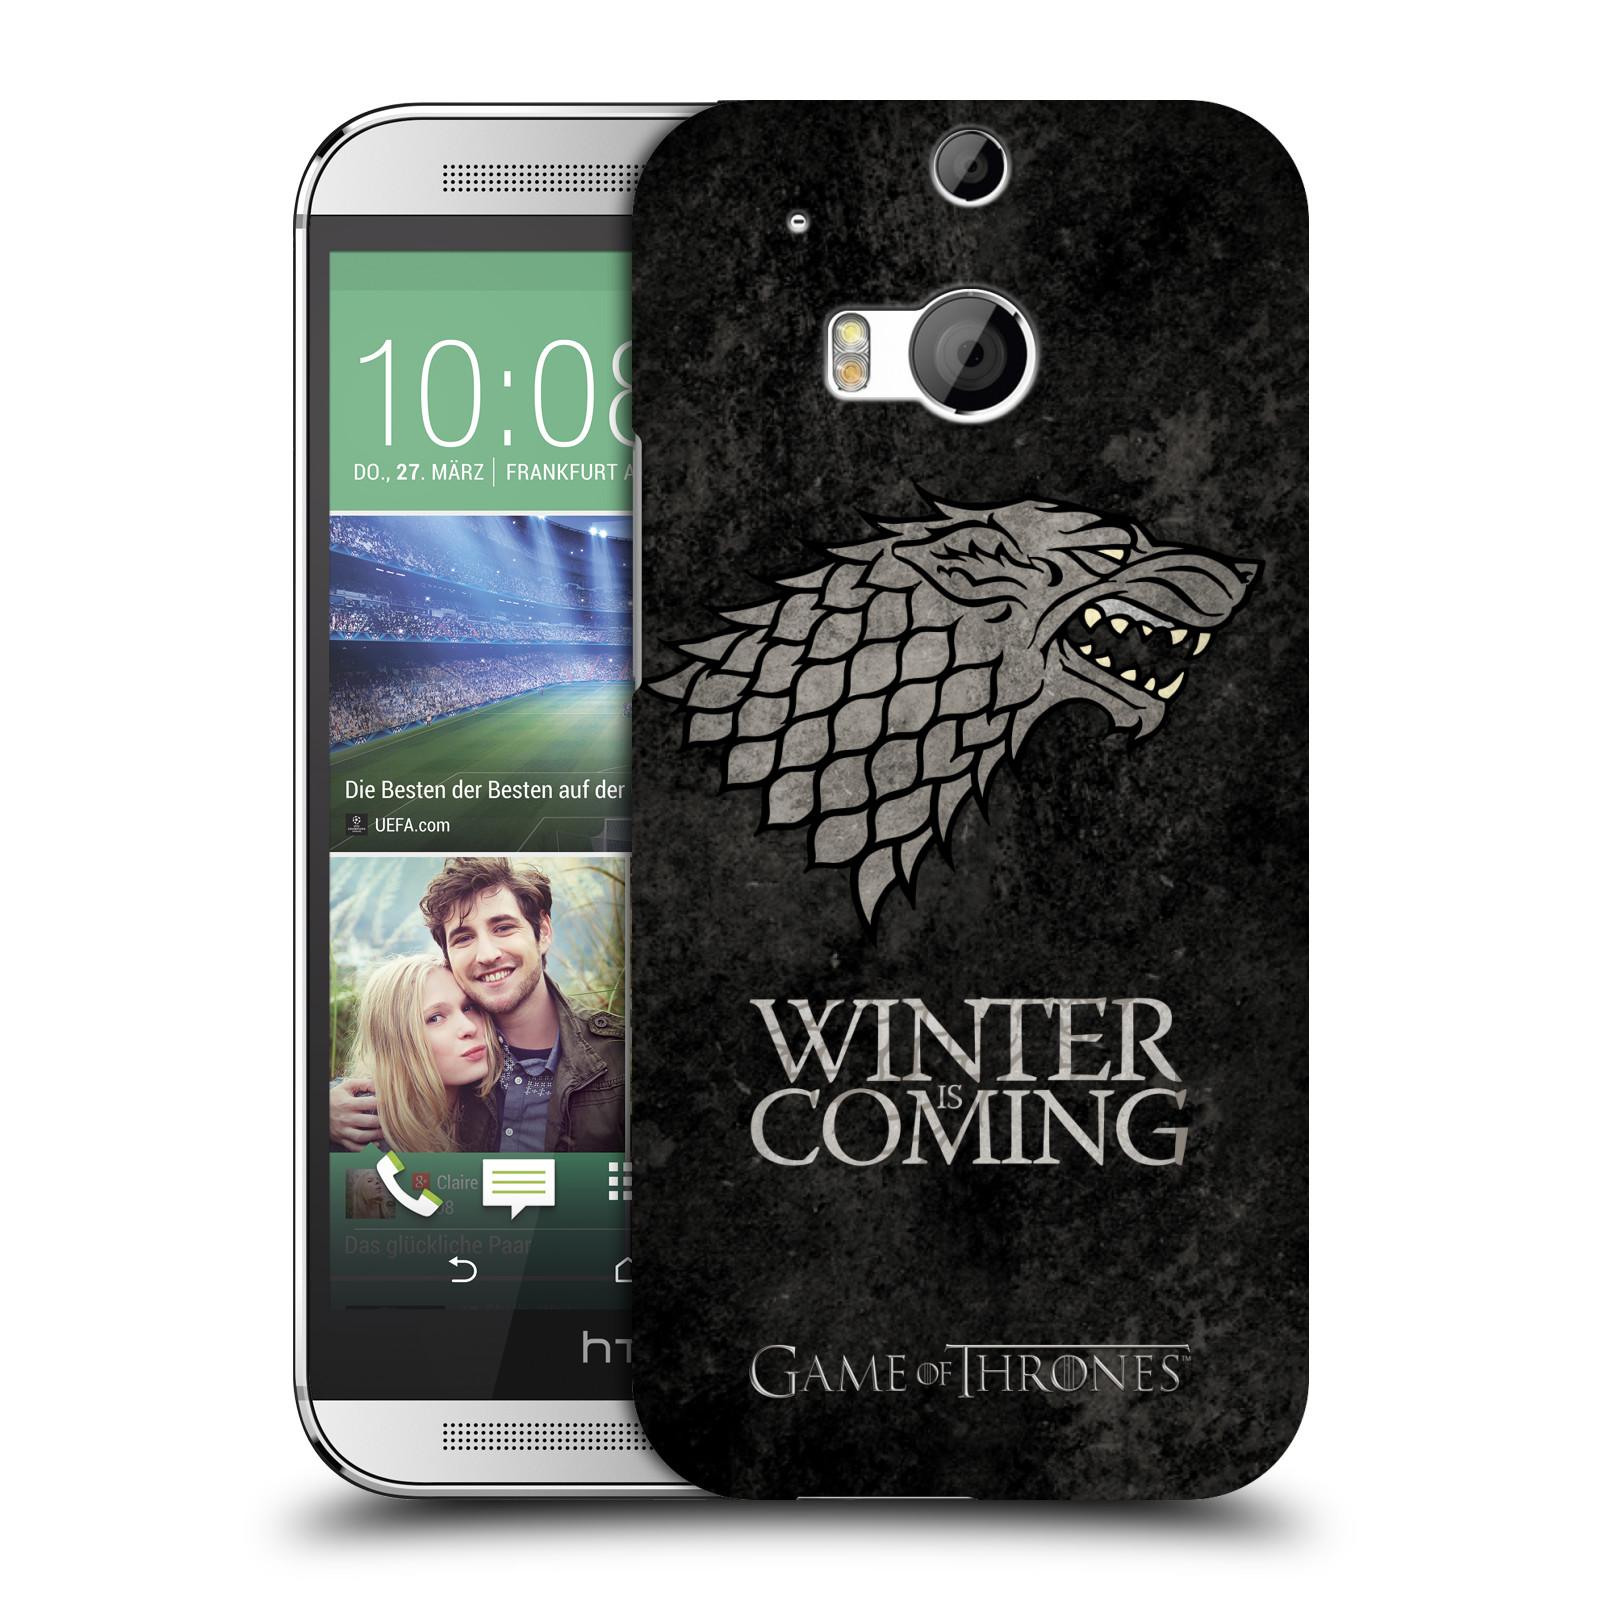 Plastové pouzdro na mobil HTC ONE M8 HEAD CASE Hra o trůny - Stark - Winter is coming